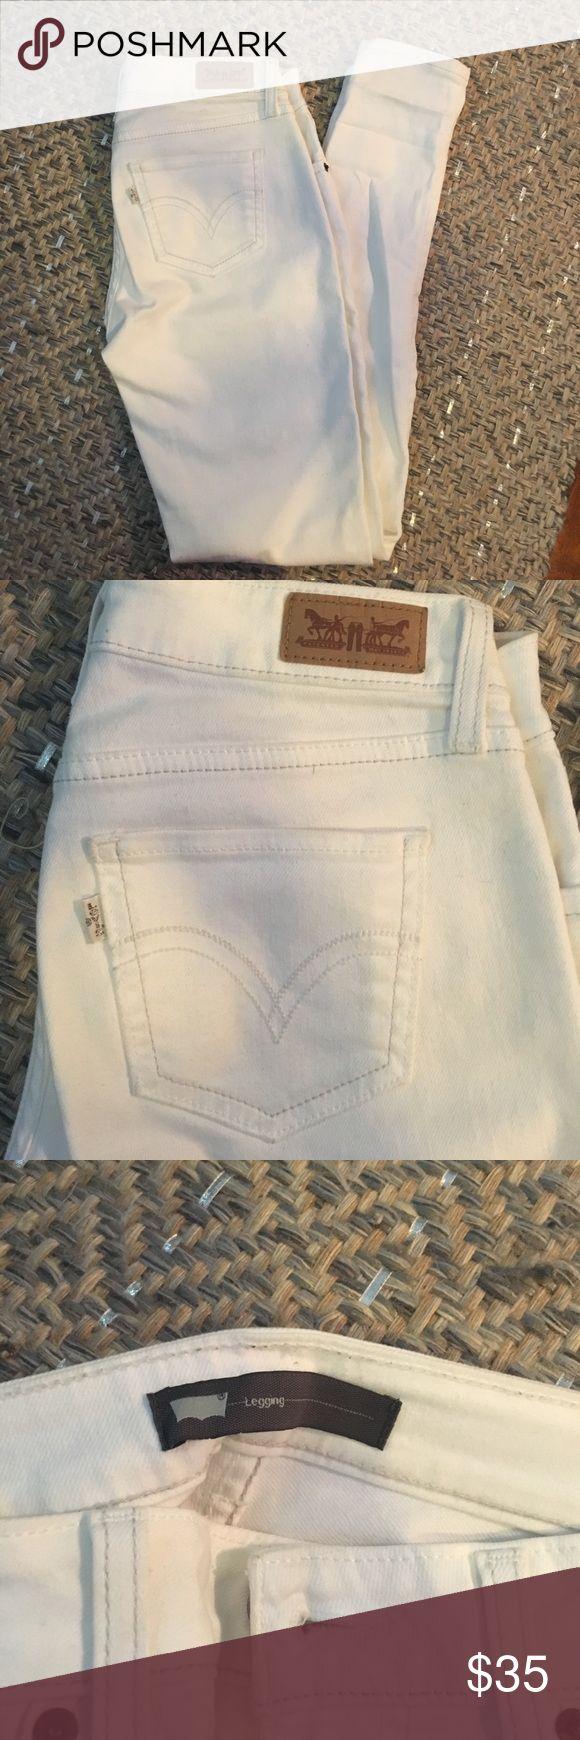 White Levi's Legging White Levi's denim legging Levi's Jeans Skinny